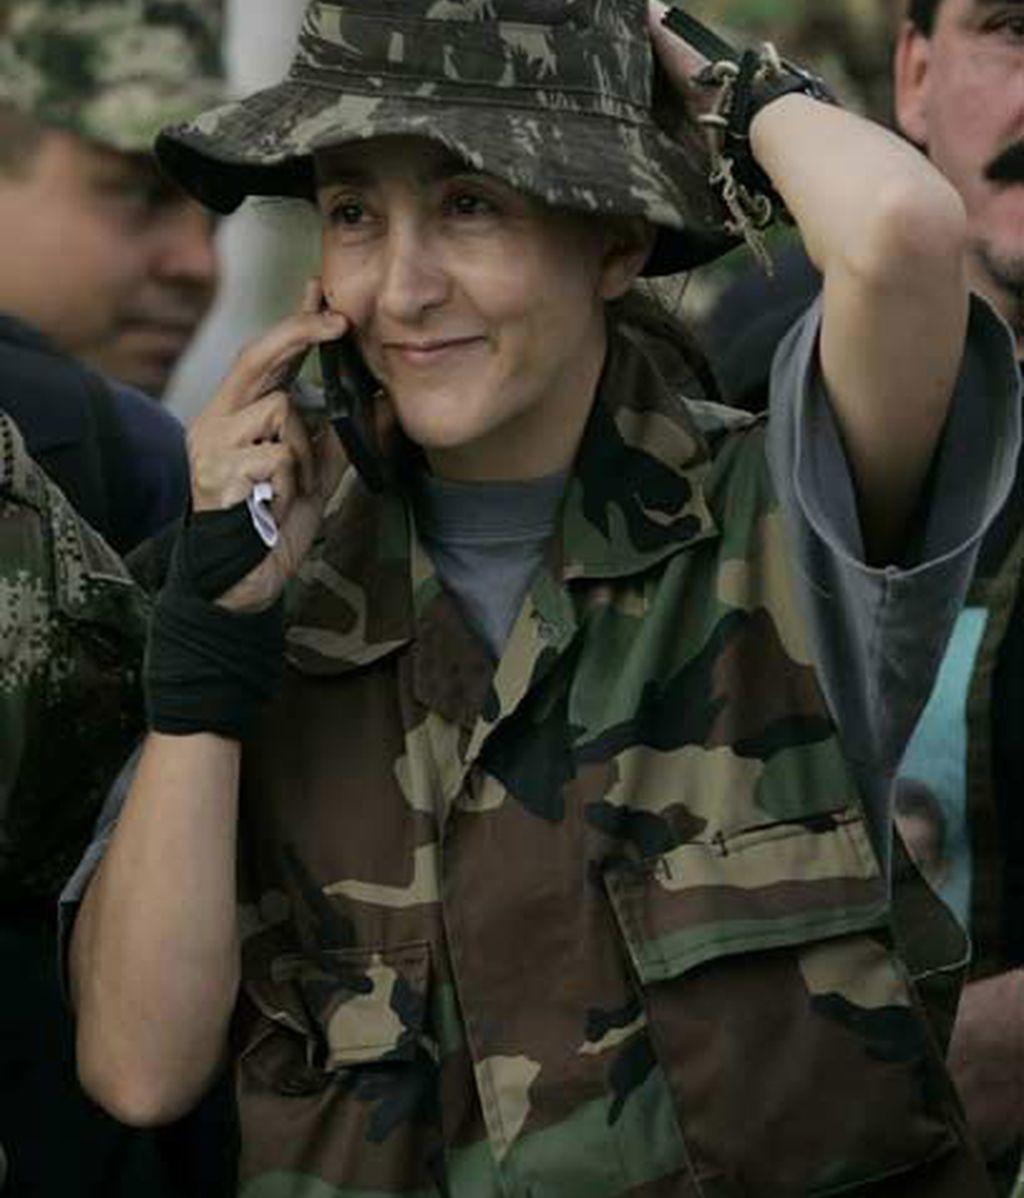 El rescate de Ingrid Betancourt